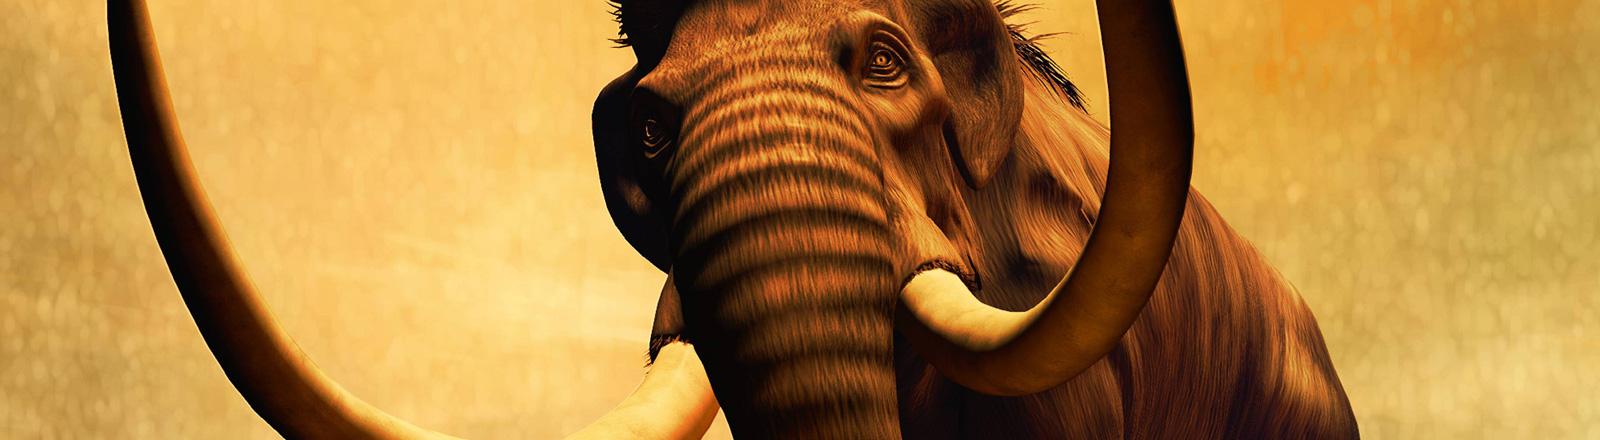 Illustration eines Mammuts